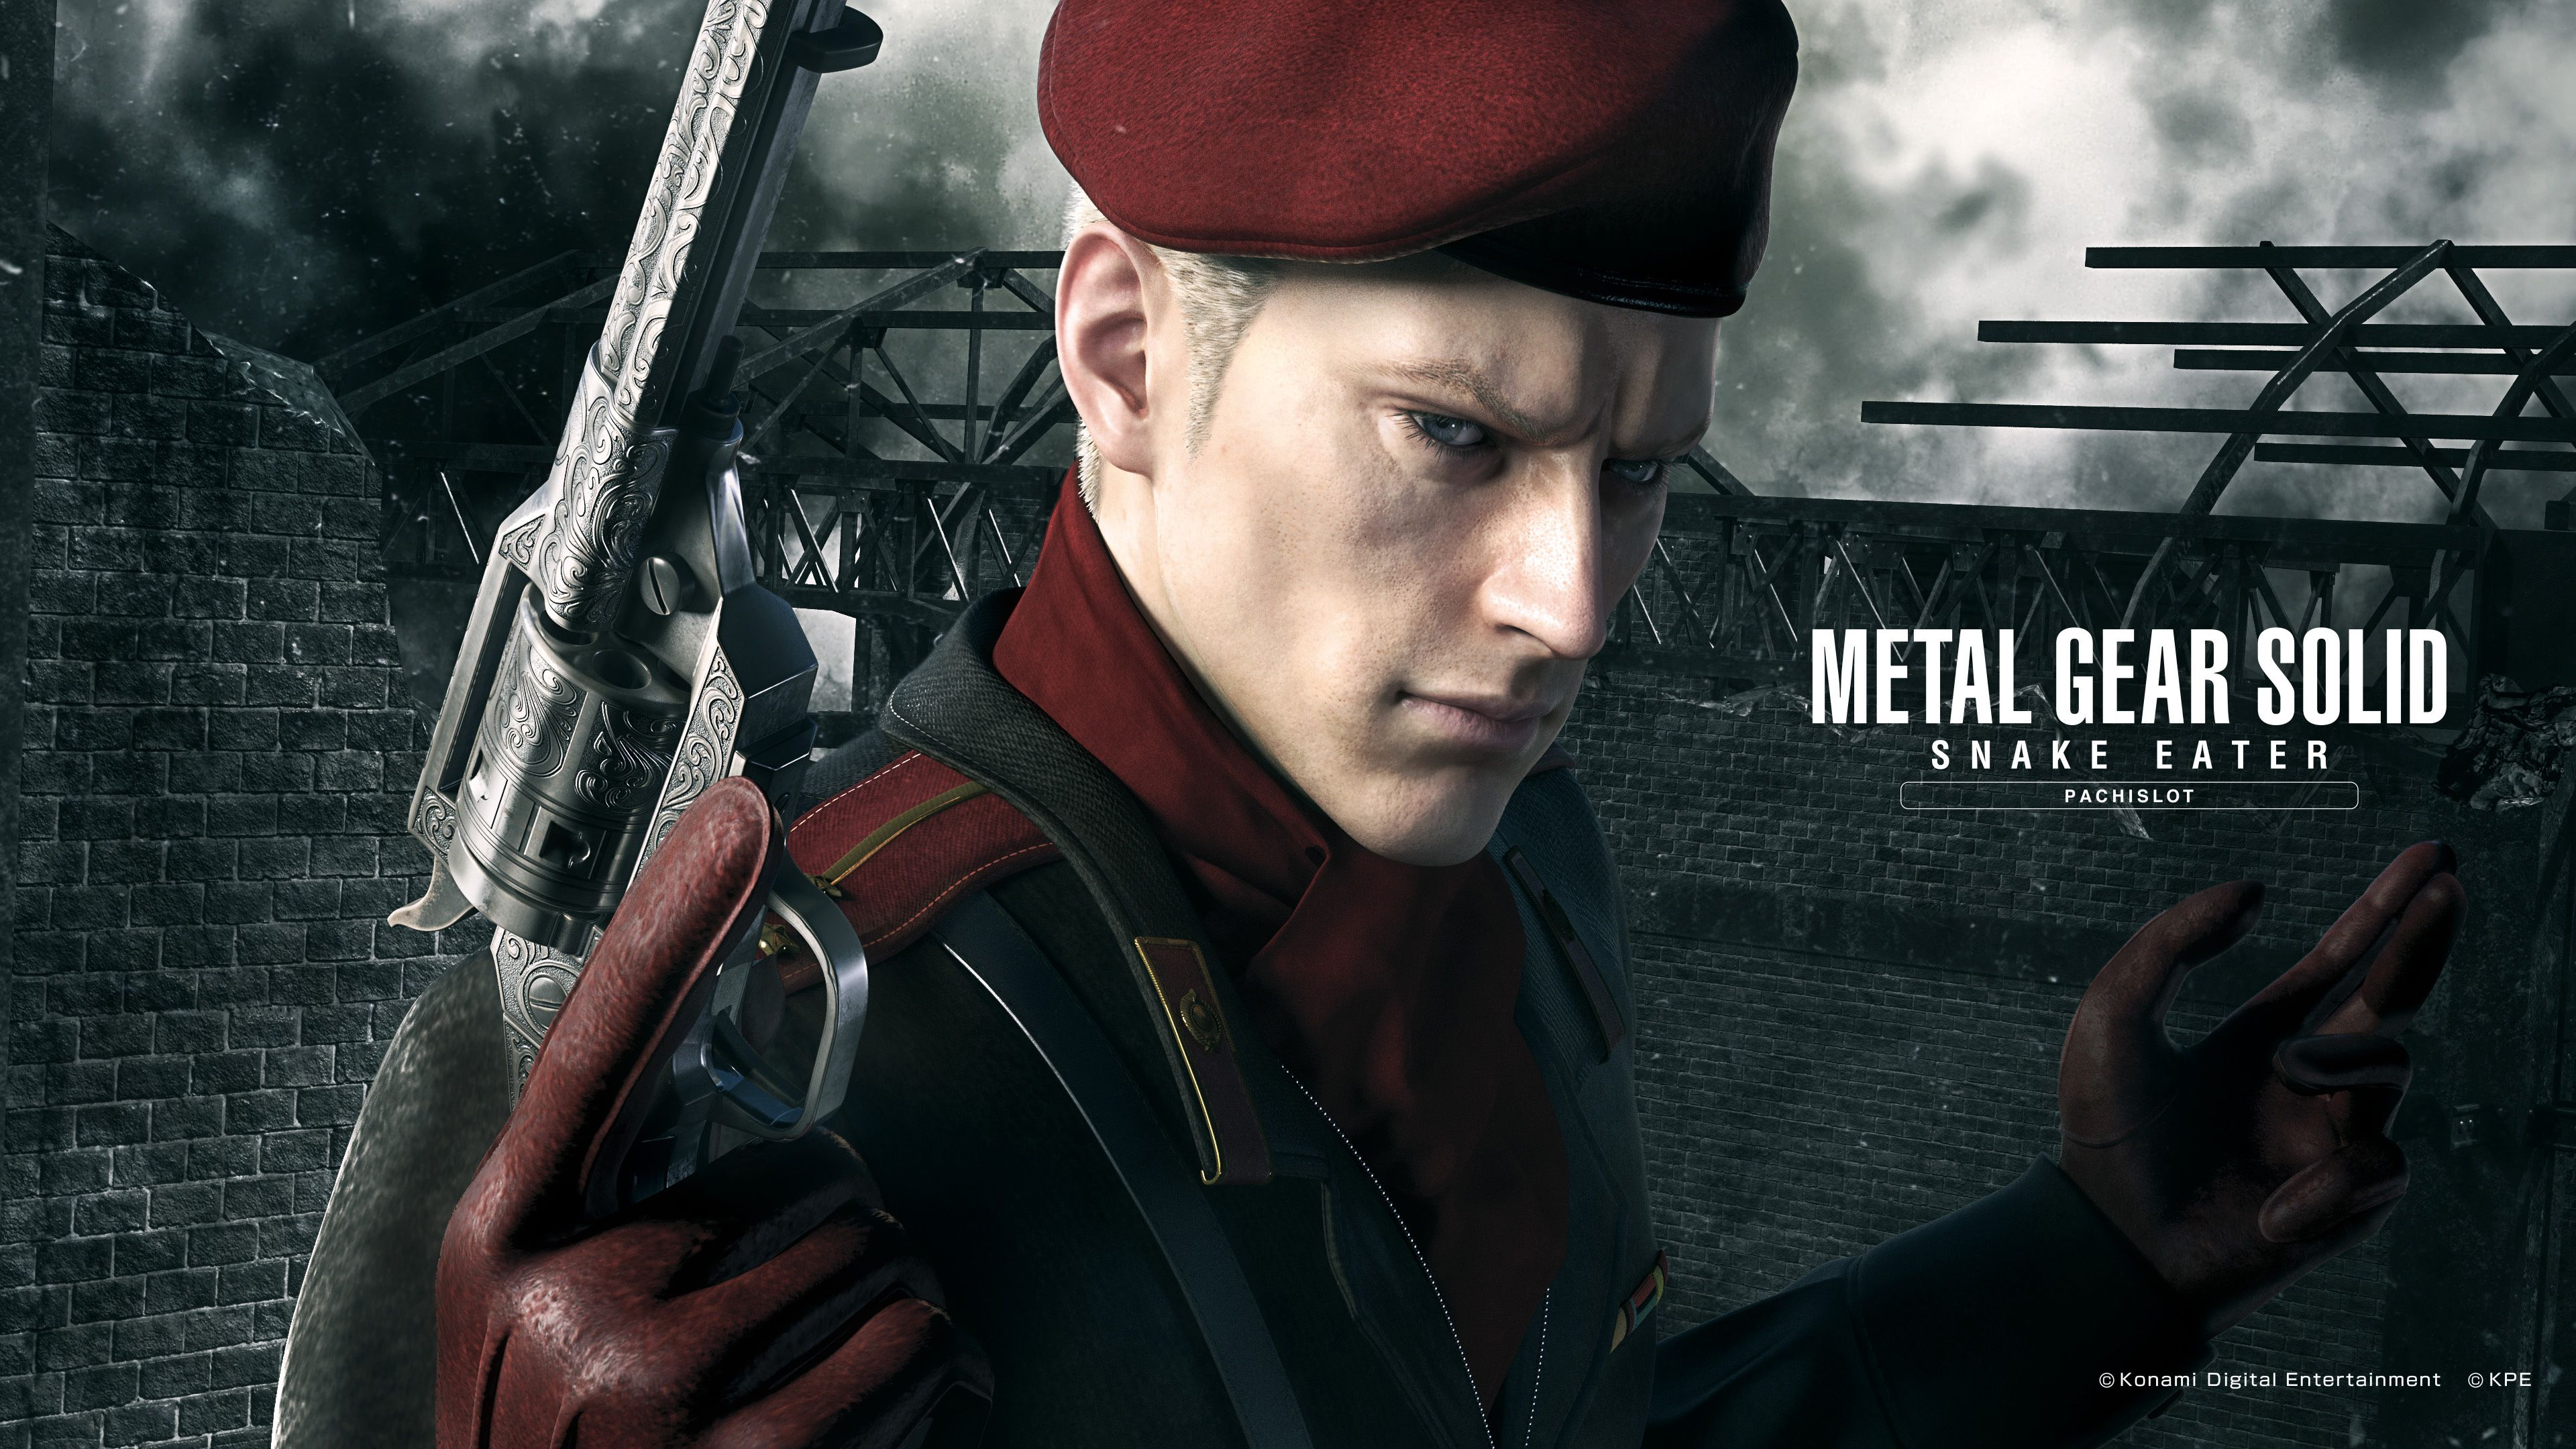 Pin By K K On メタルギア Metal Gear Solid Metal Gear Metal Gear Solid Quiet